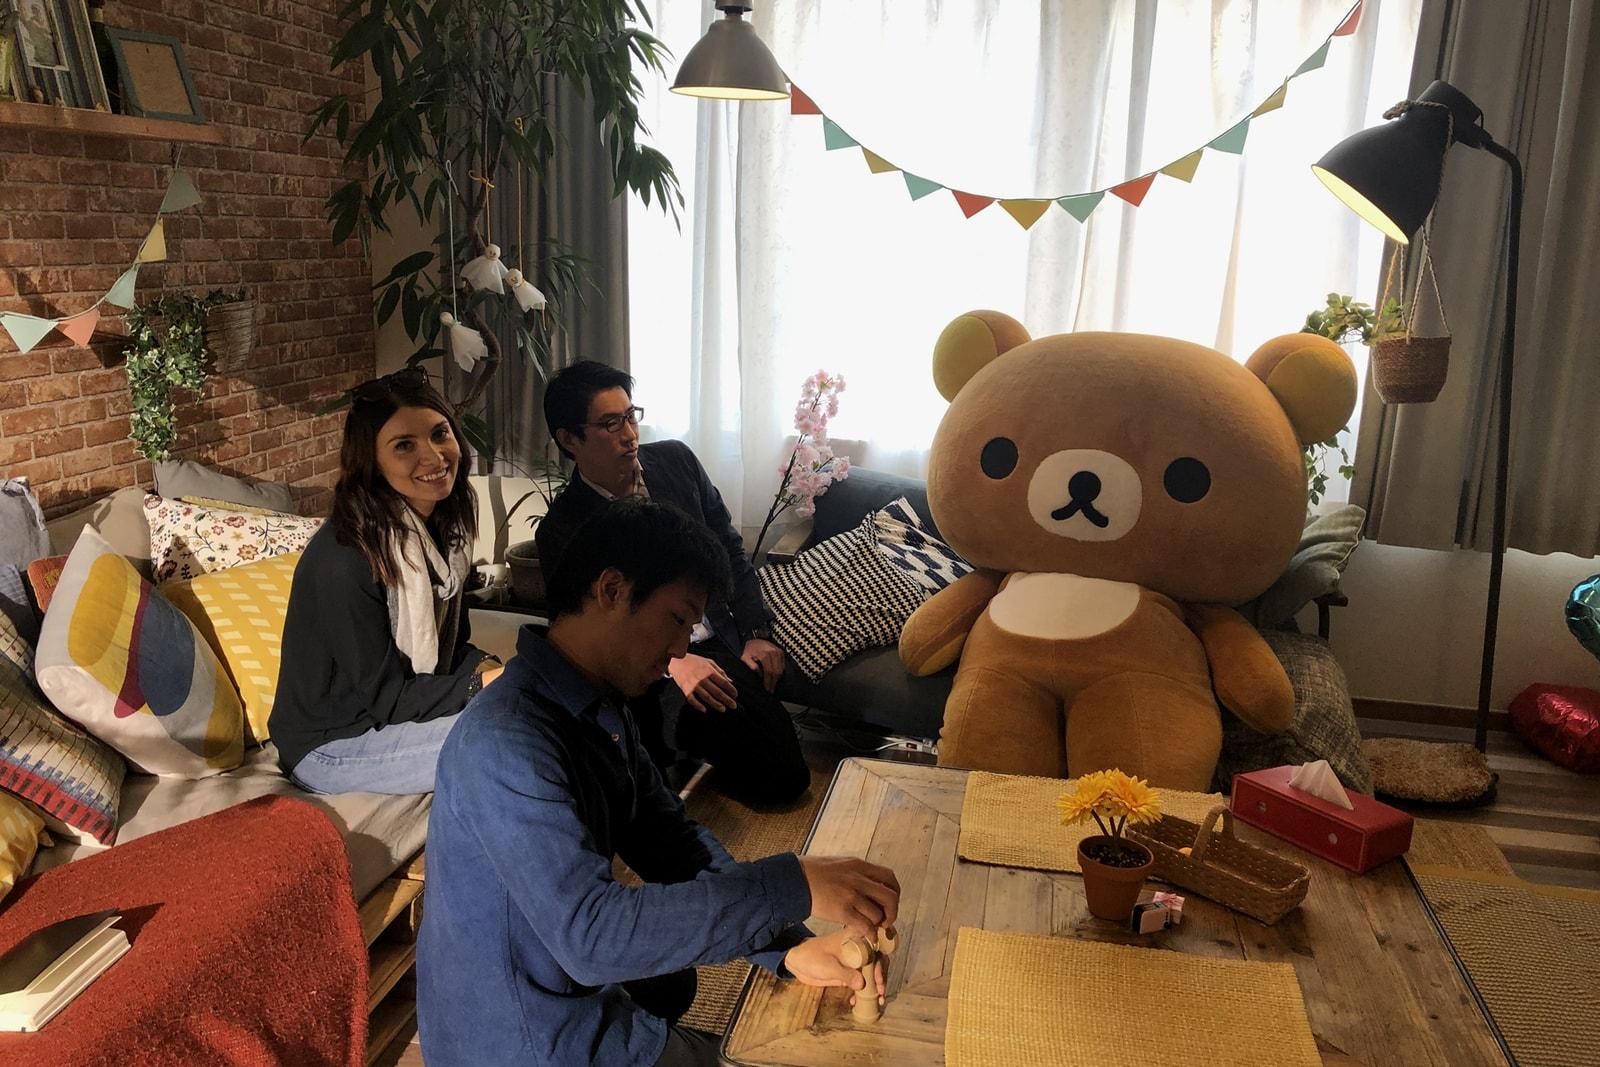 Alex Burunova 'Enter the Anime' Interview Netflix Original interviews documentaries japan art drawings manga 7 seeds Adi Shankar Castlevania Kengan Ashura Seiji Kishi